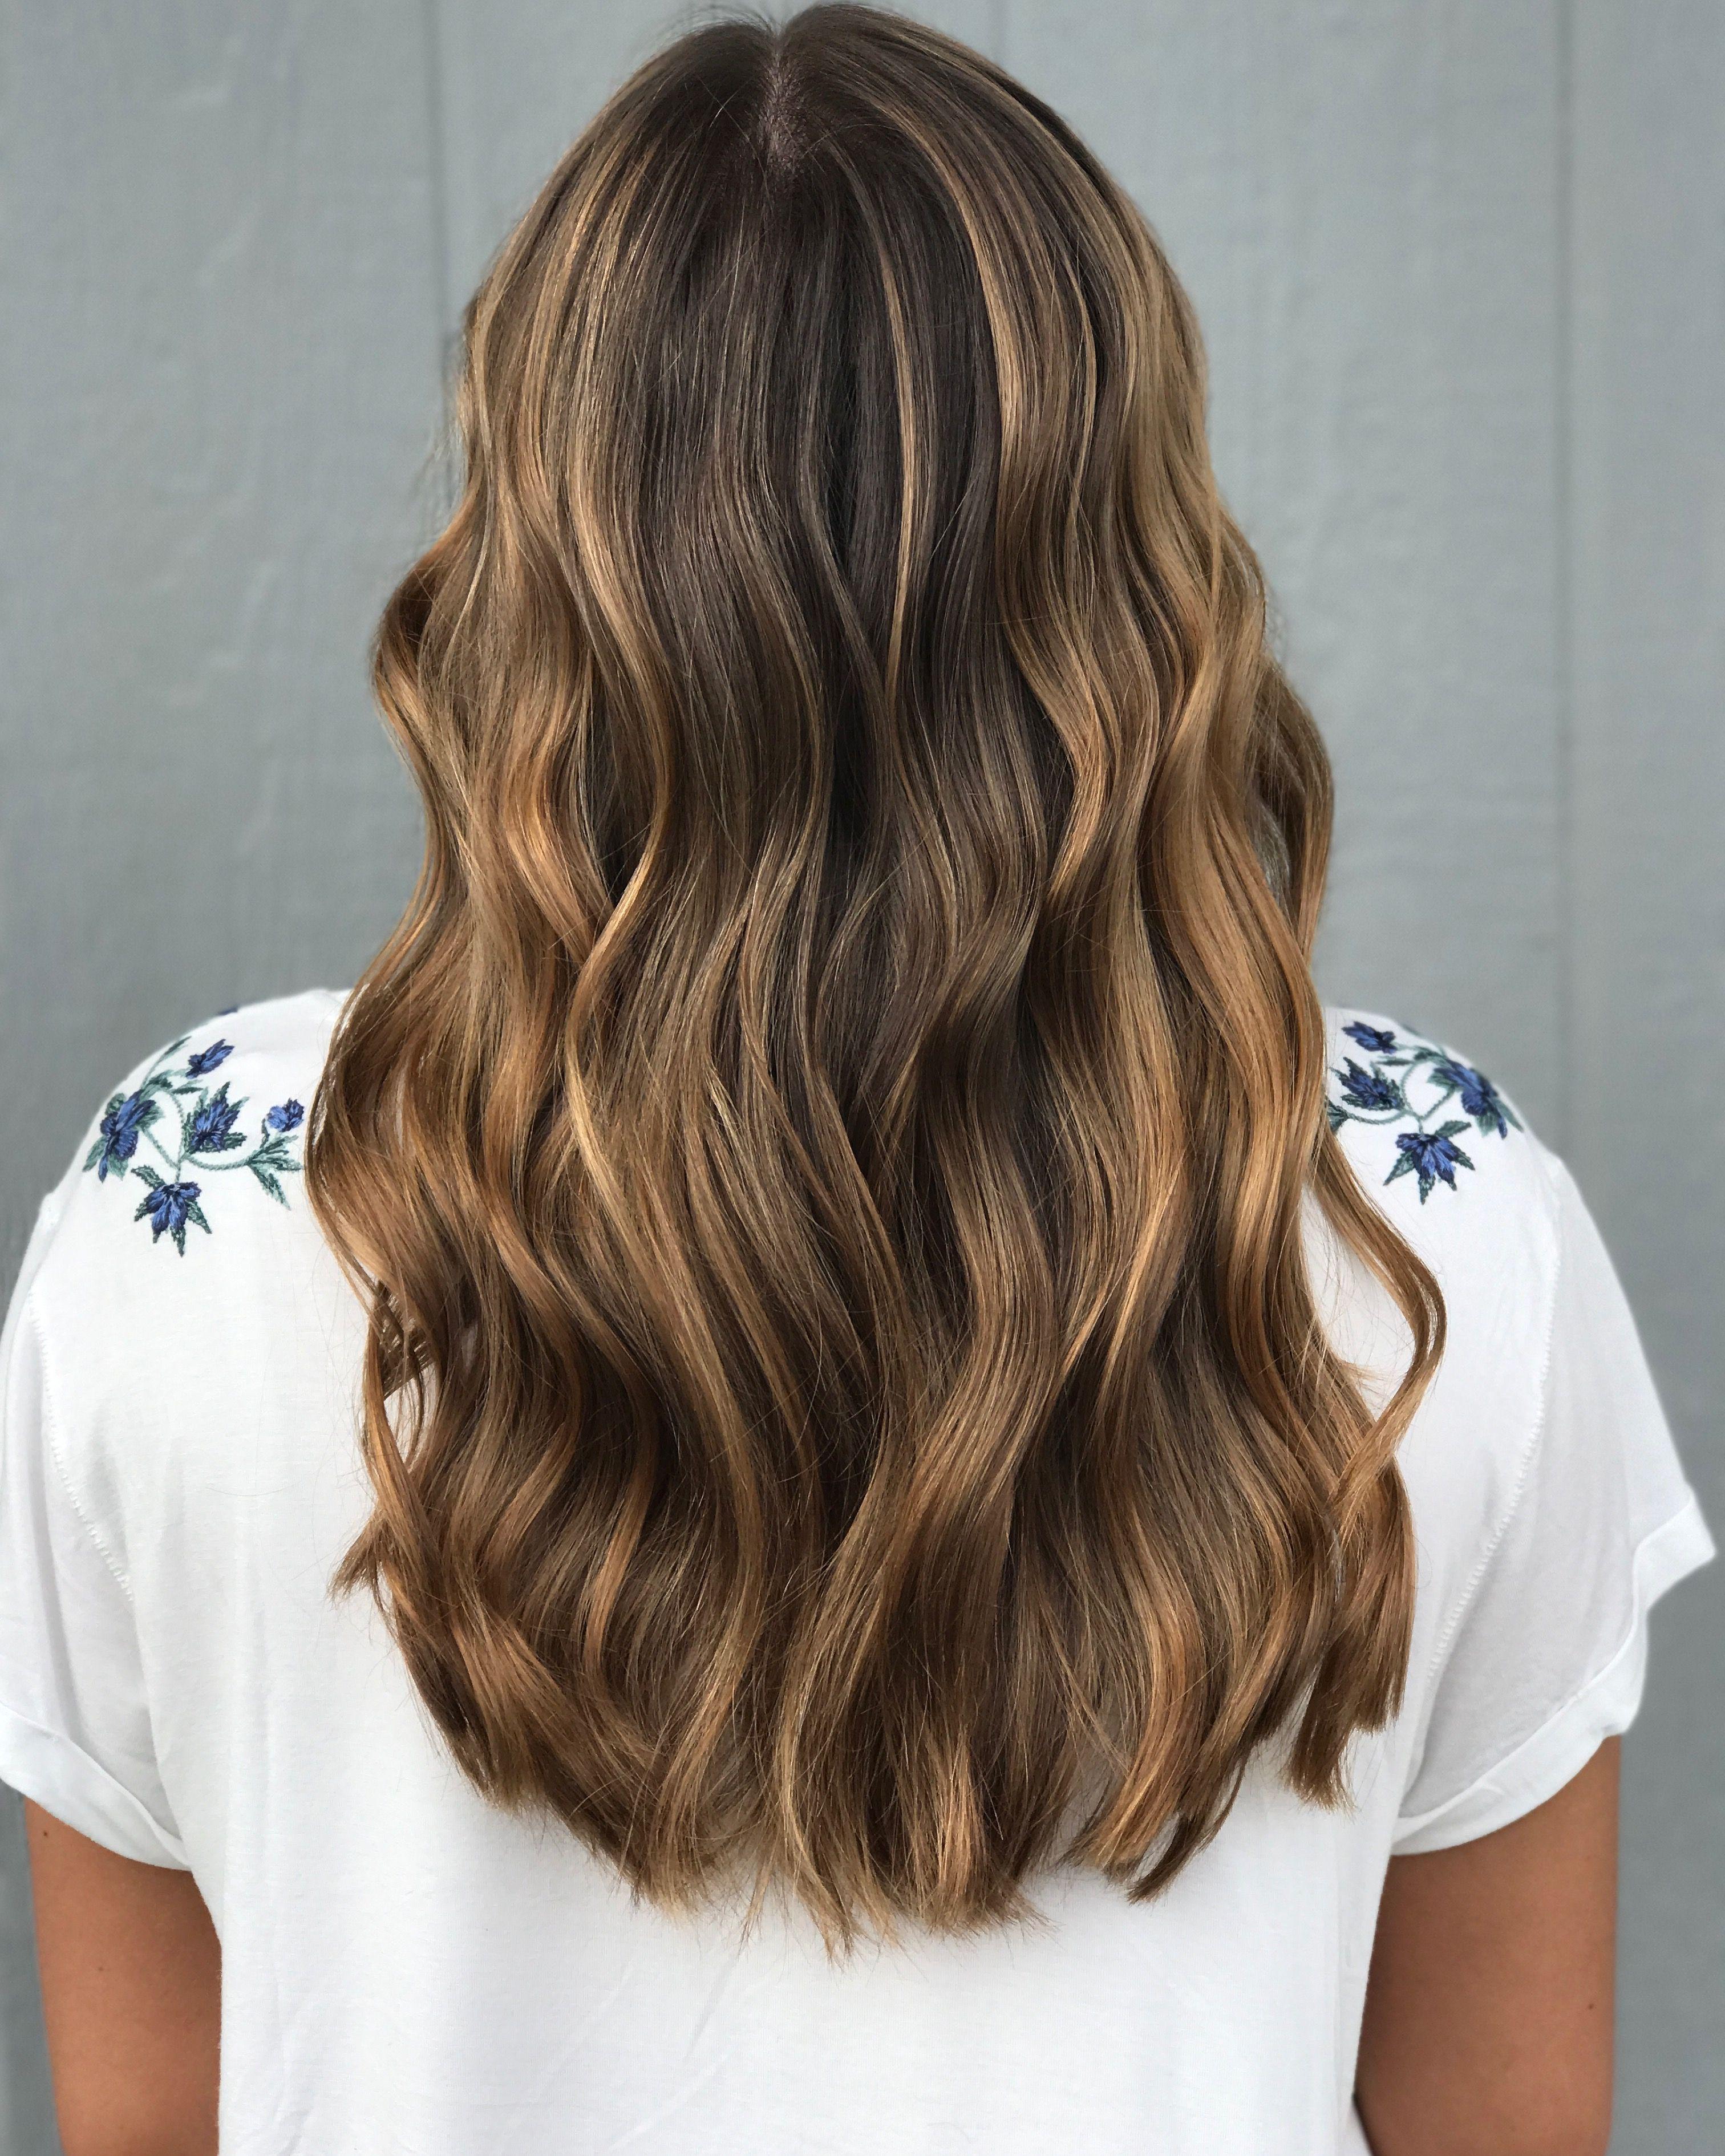 Balayage #hairbyashleytaylor #balayage #highlights #fallhair #healthyhair #redken